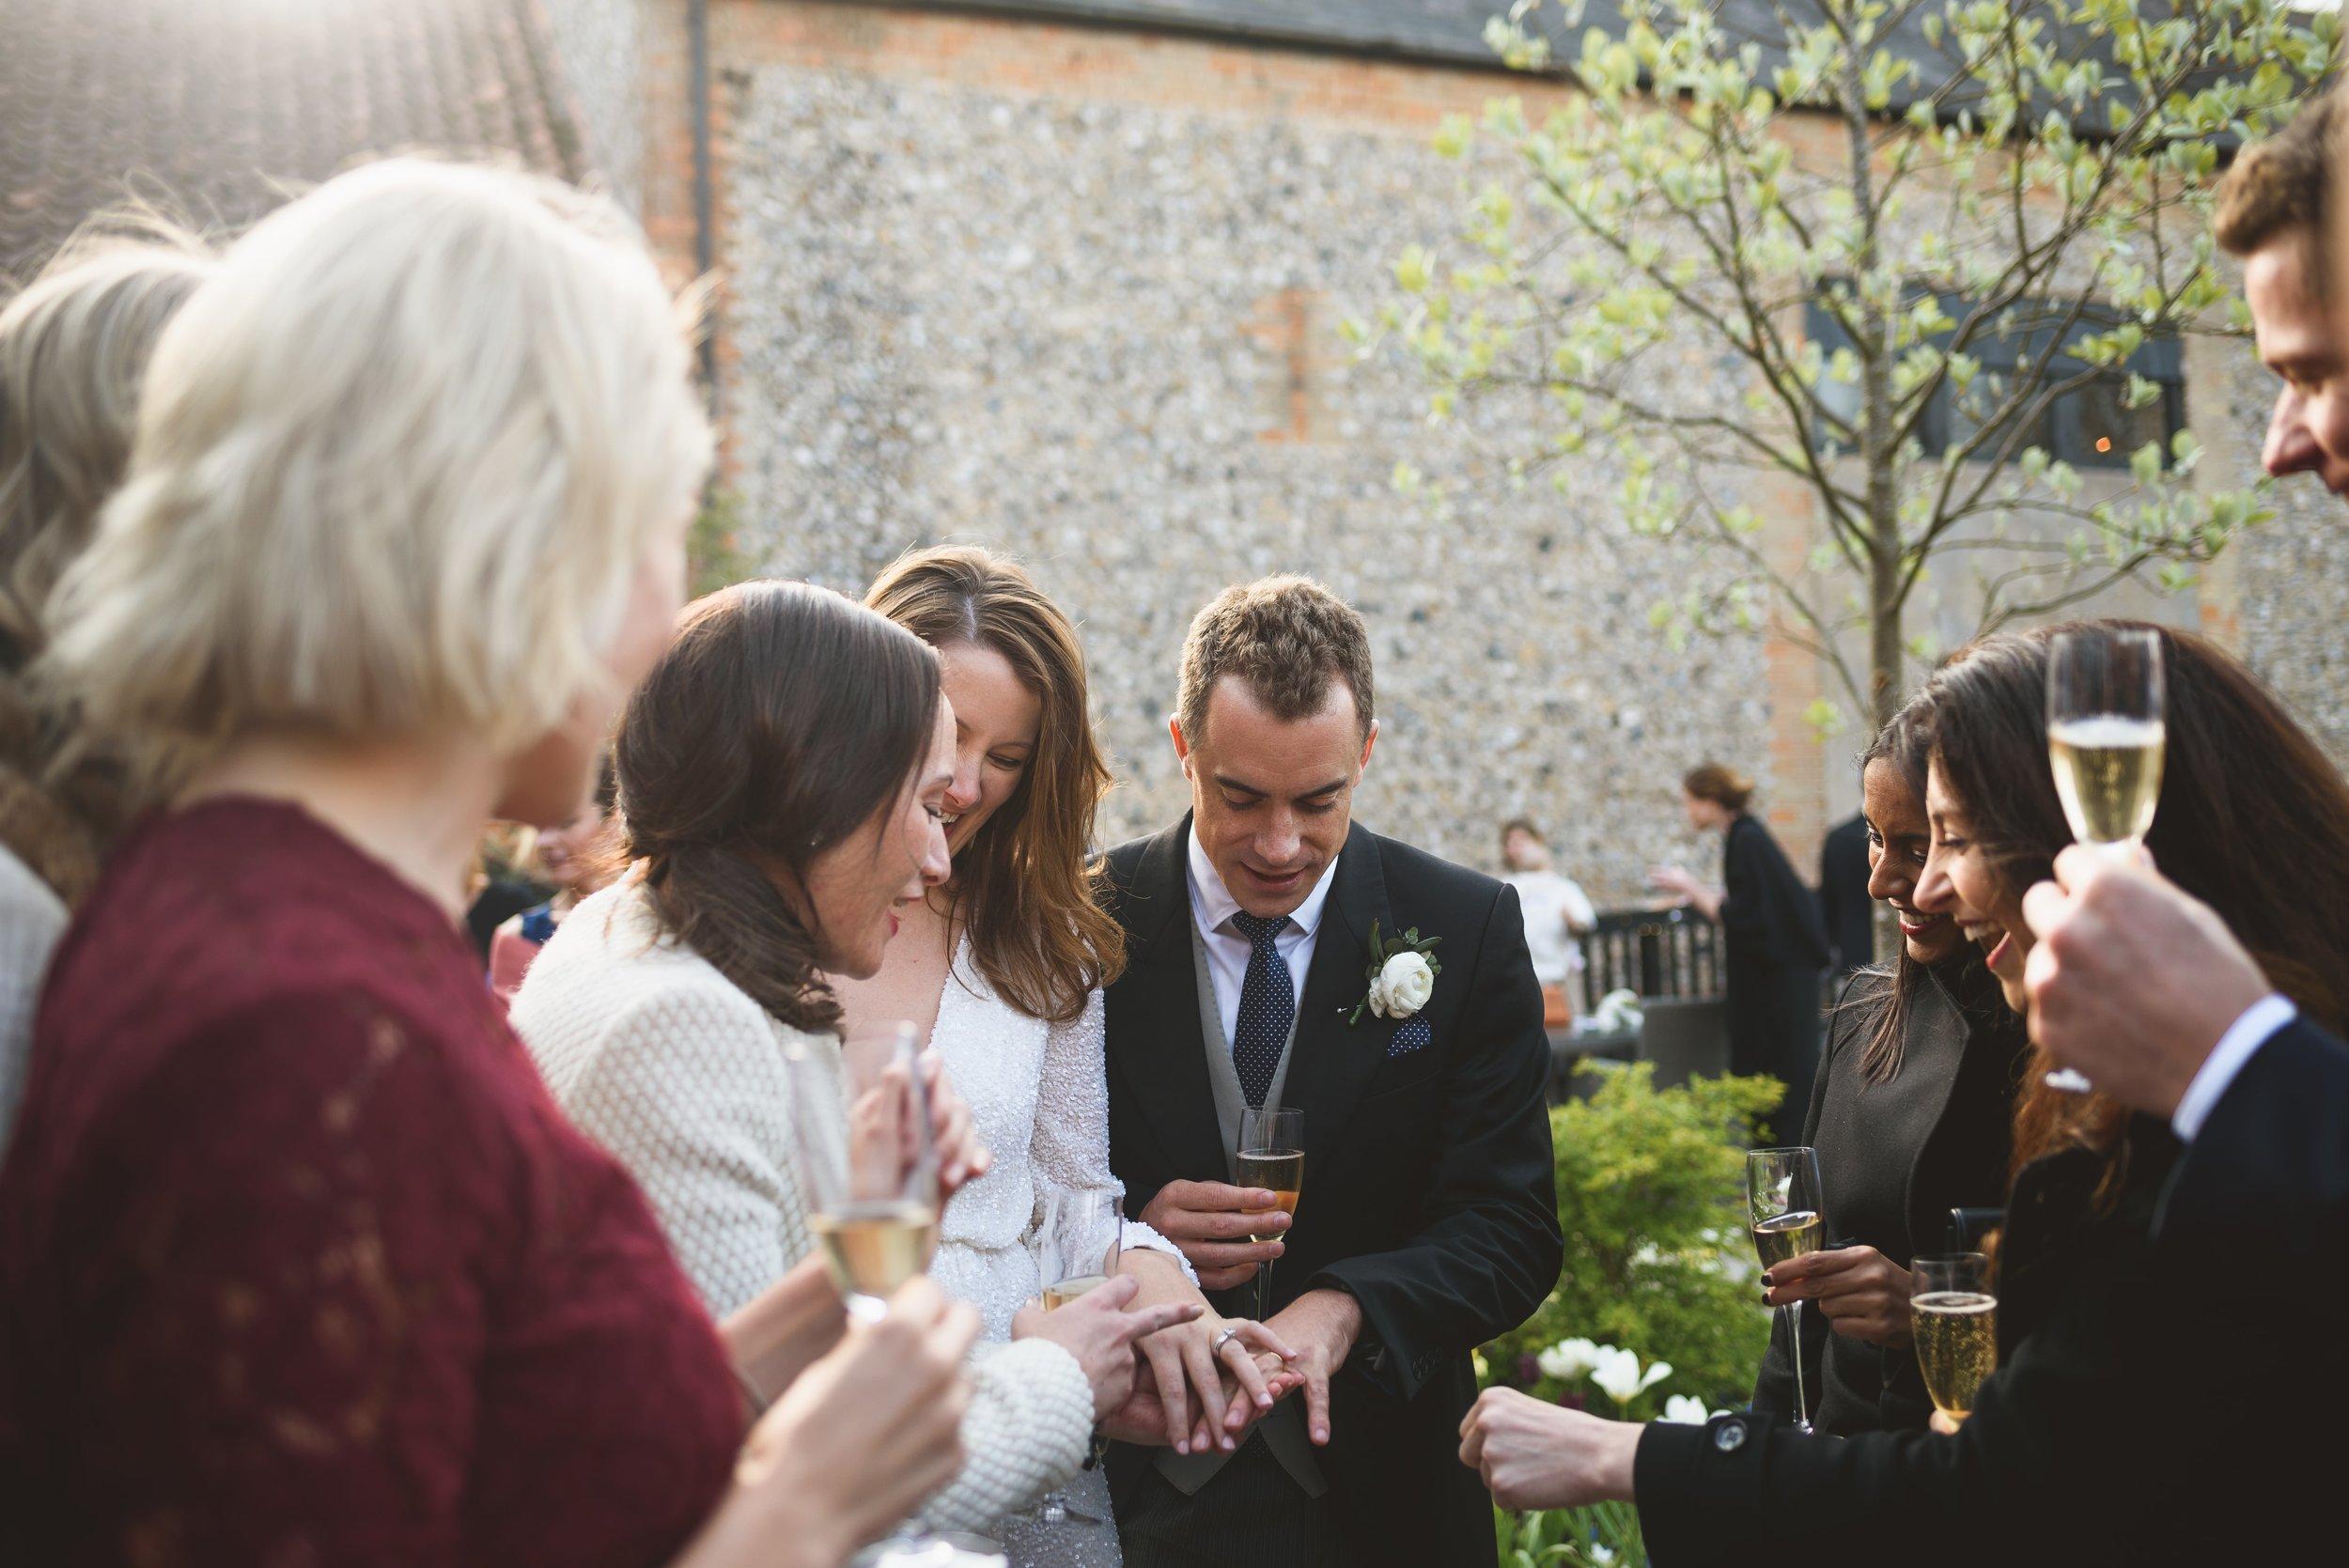 The Granary Estates Wedding Photographer - Jackson & Co Photography00540-min.JPG